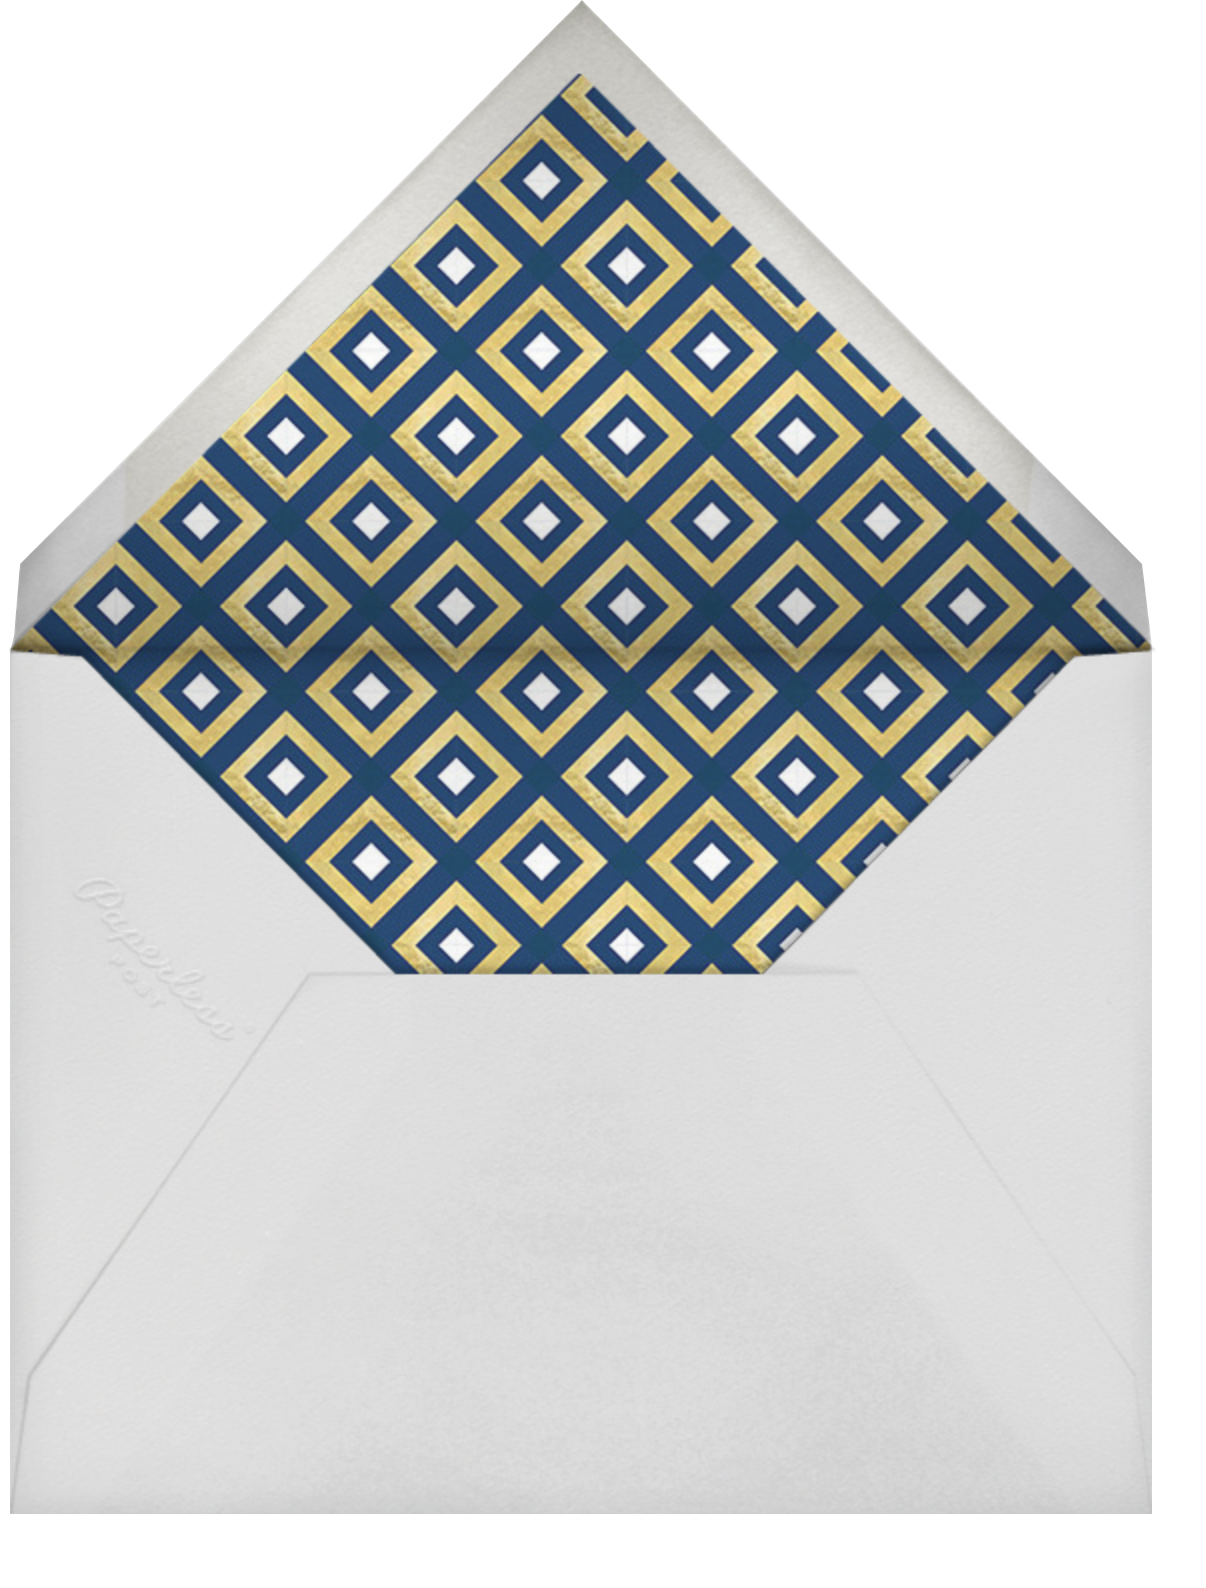 Bobo - Gold and Navy Blue - Jonathan Adler - Bat and bar mitzvah - envelope back